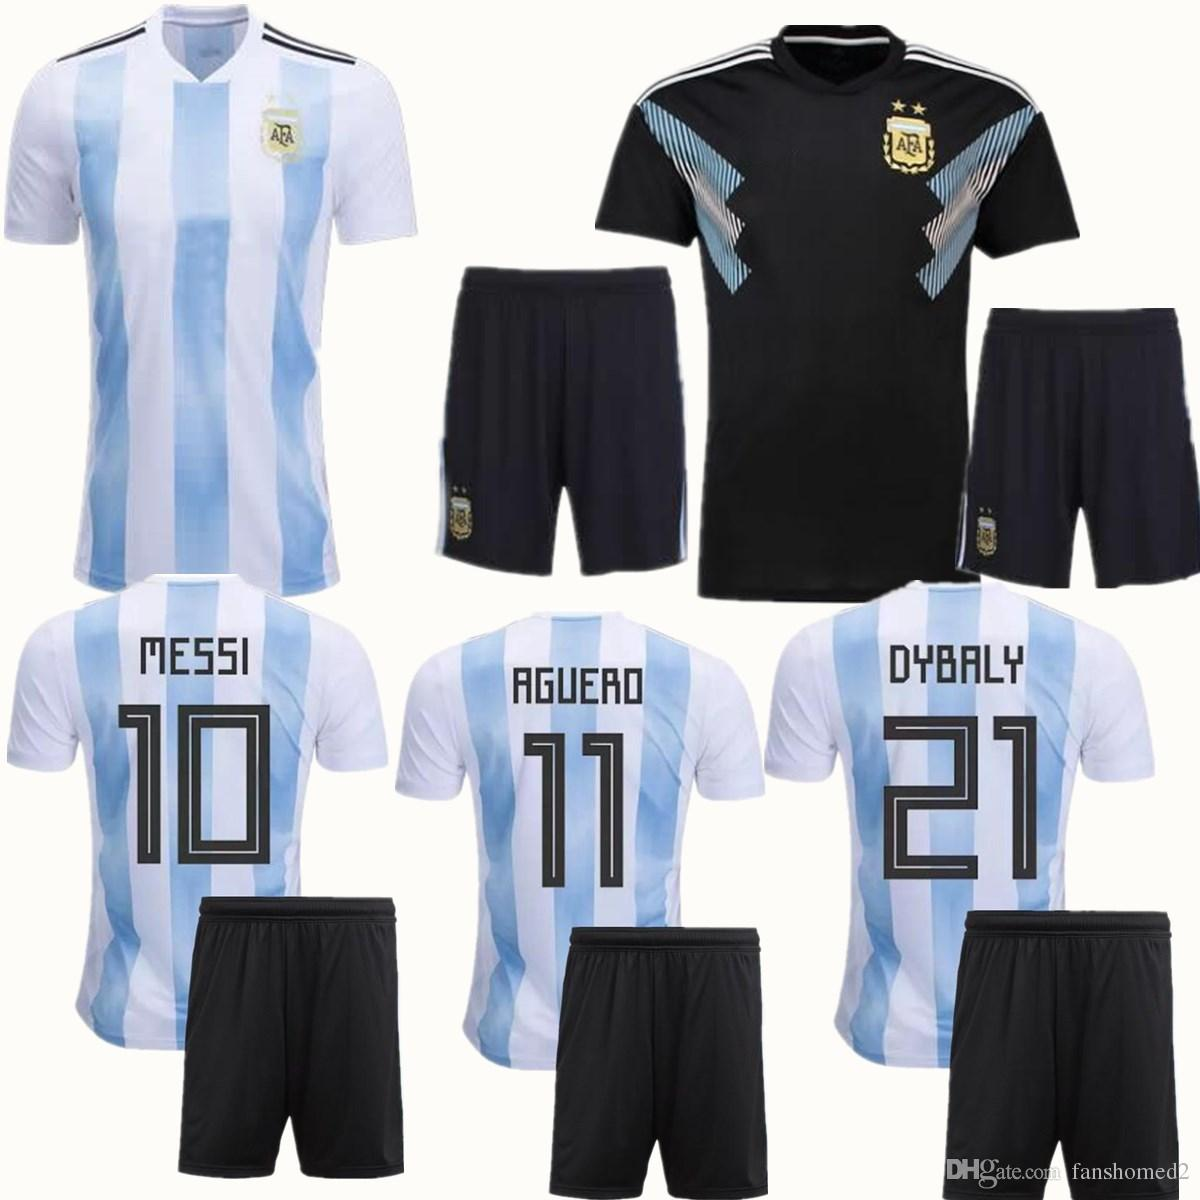 862bb6c846 Compre 2018 Copa Do Mundo Argentina Afastado Conjuntos De Futebol Messi Di  Maria Aguero Komewany Dybal Jersey Longe Black Kit Adultos Uniforme Conjunto  De ...